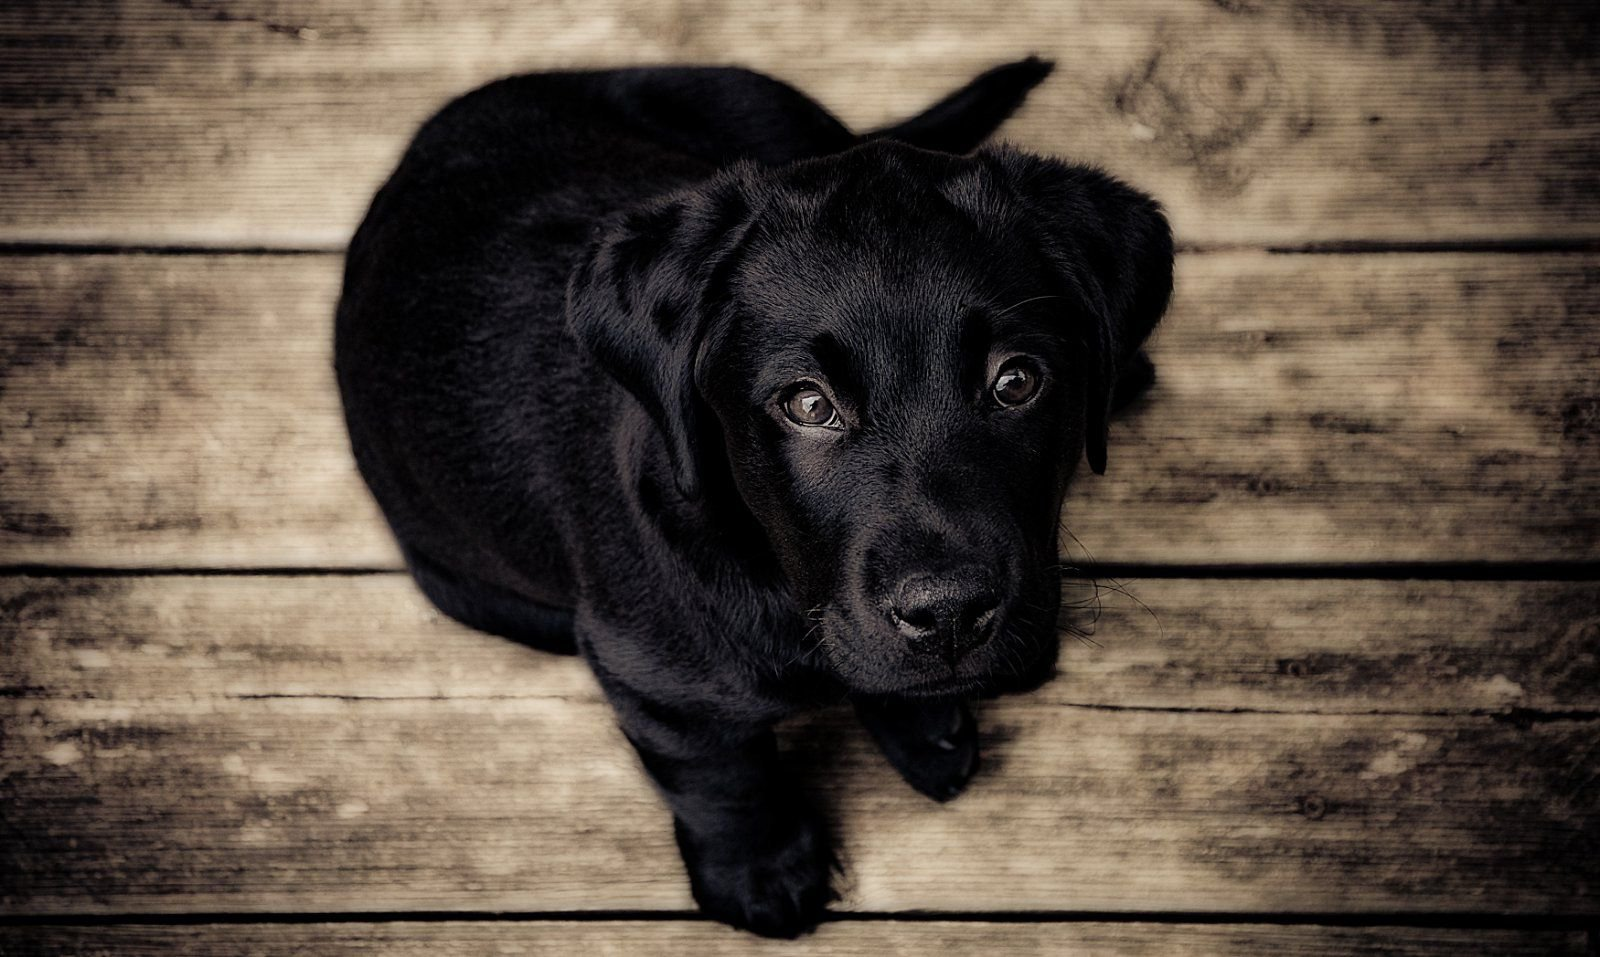 pets-direct-pet-shop-alloa-puppy.jpg